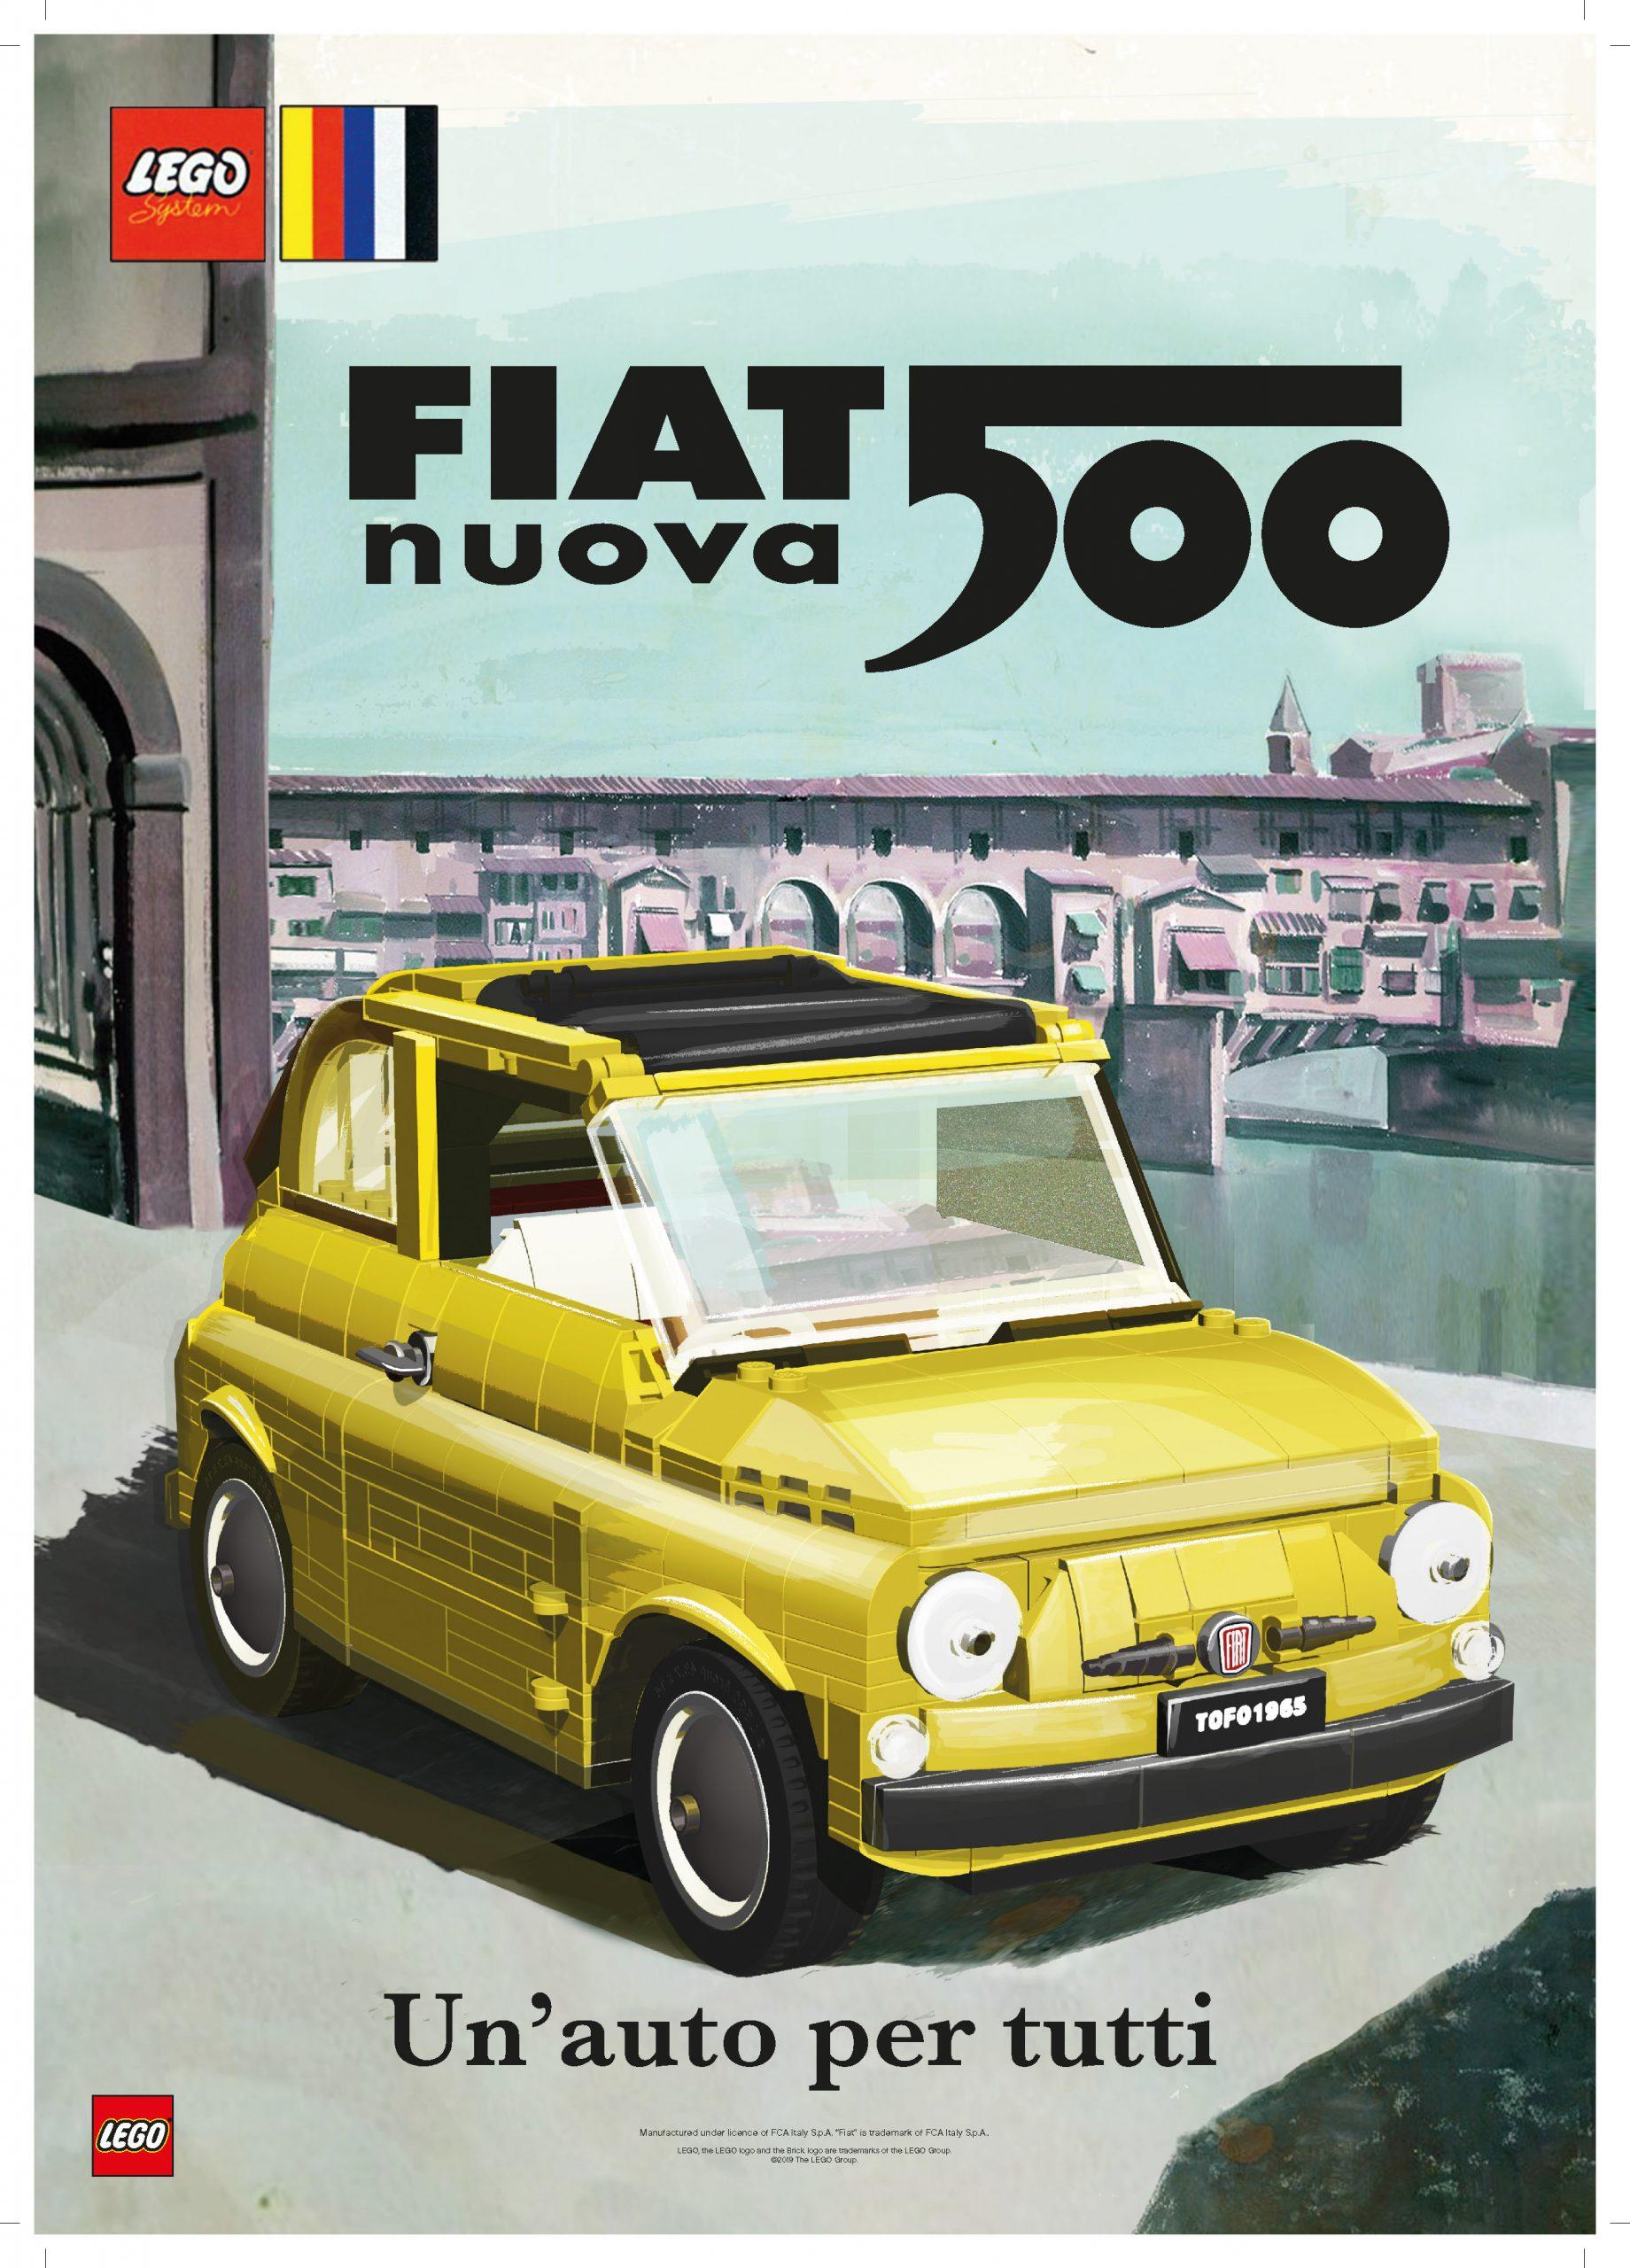 Design Per Tutti Com lego creator expert 10271 fiat 500 - vintage posters - evc1y